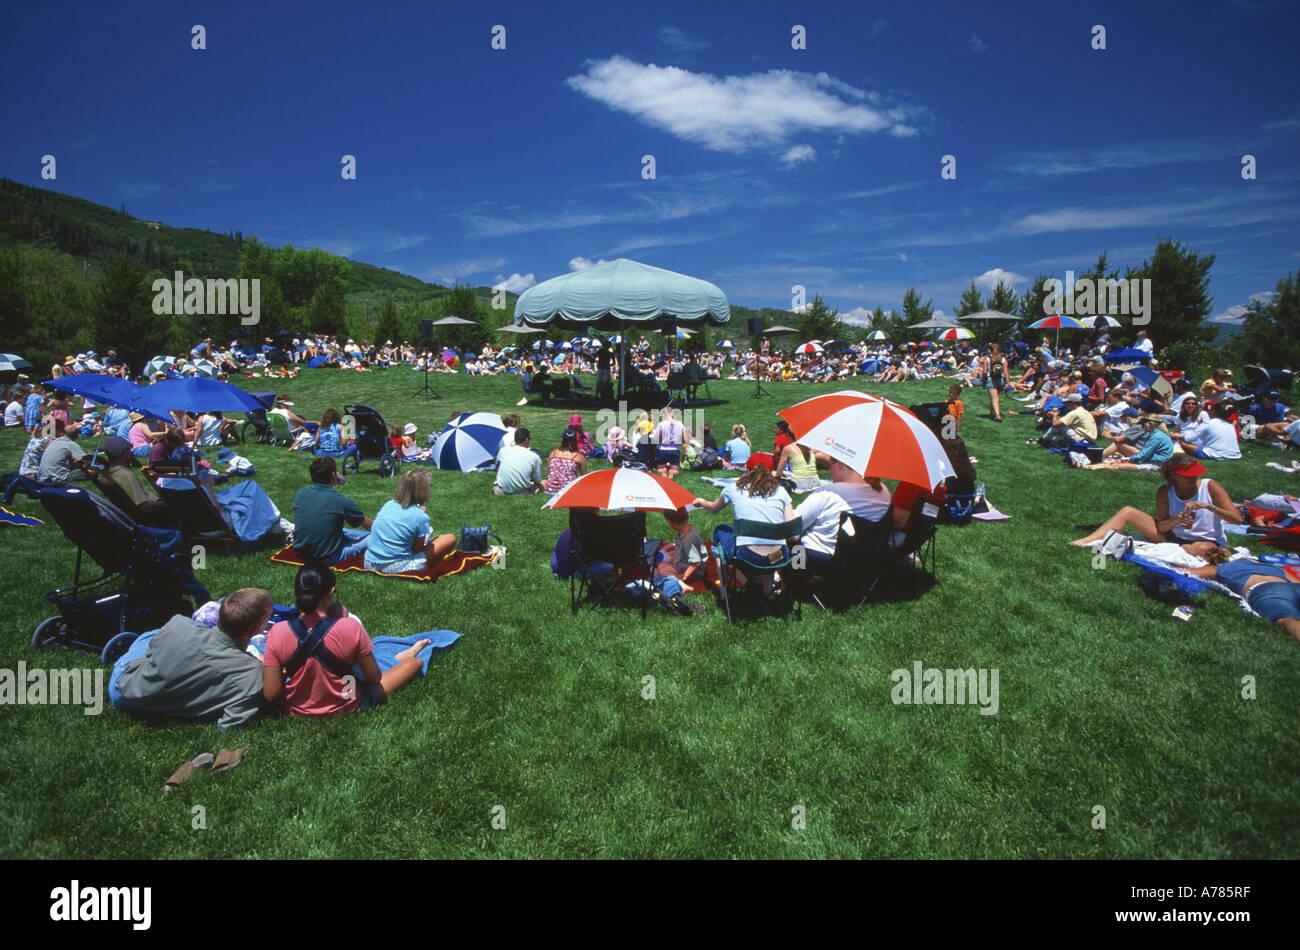 Menge im Freienkonzert Yampa River botanischen Park, Steamboat Springs, Colorado, USA. Stockbild